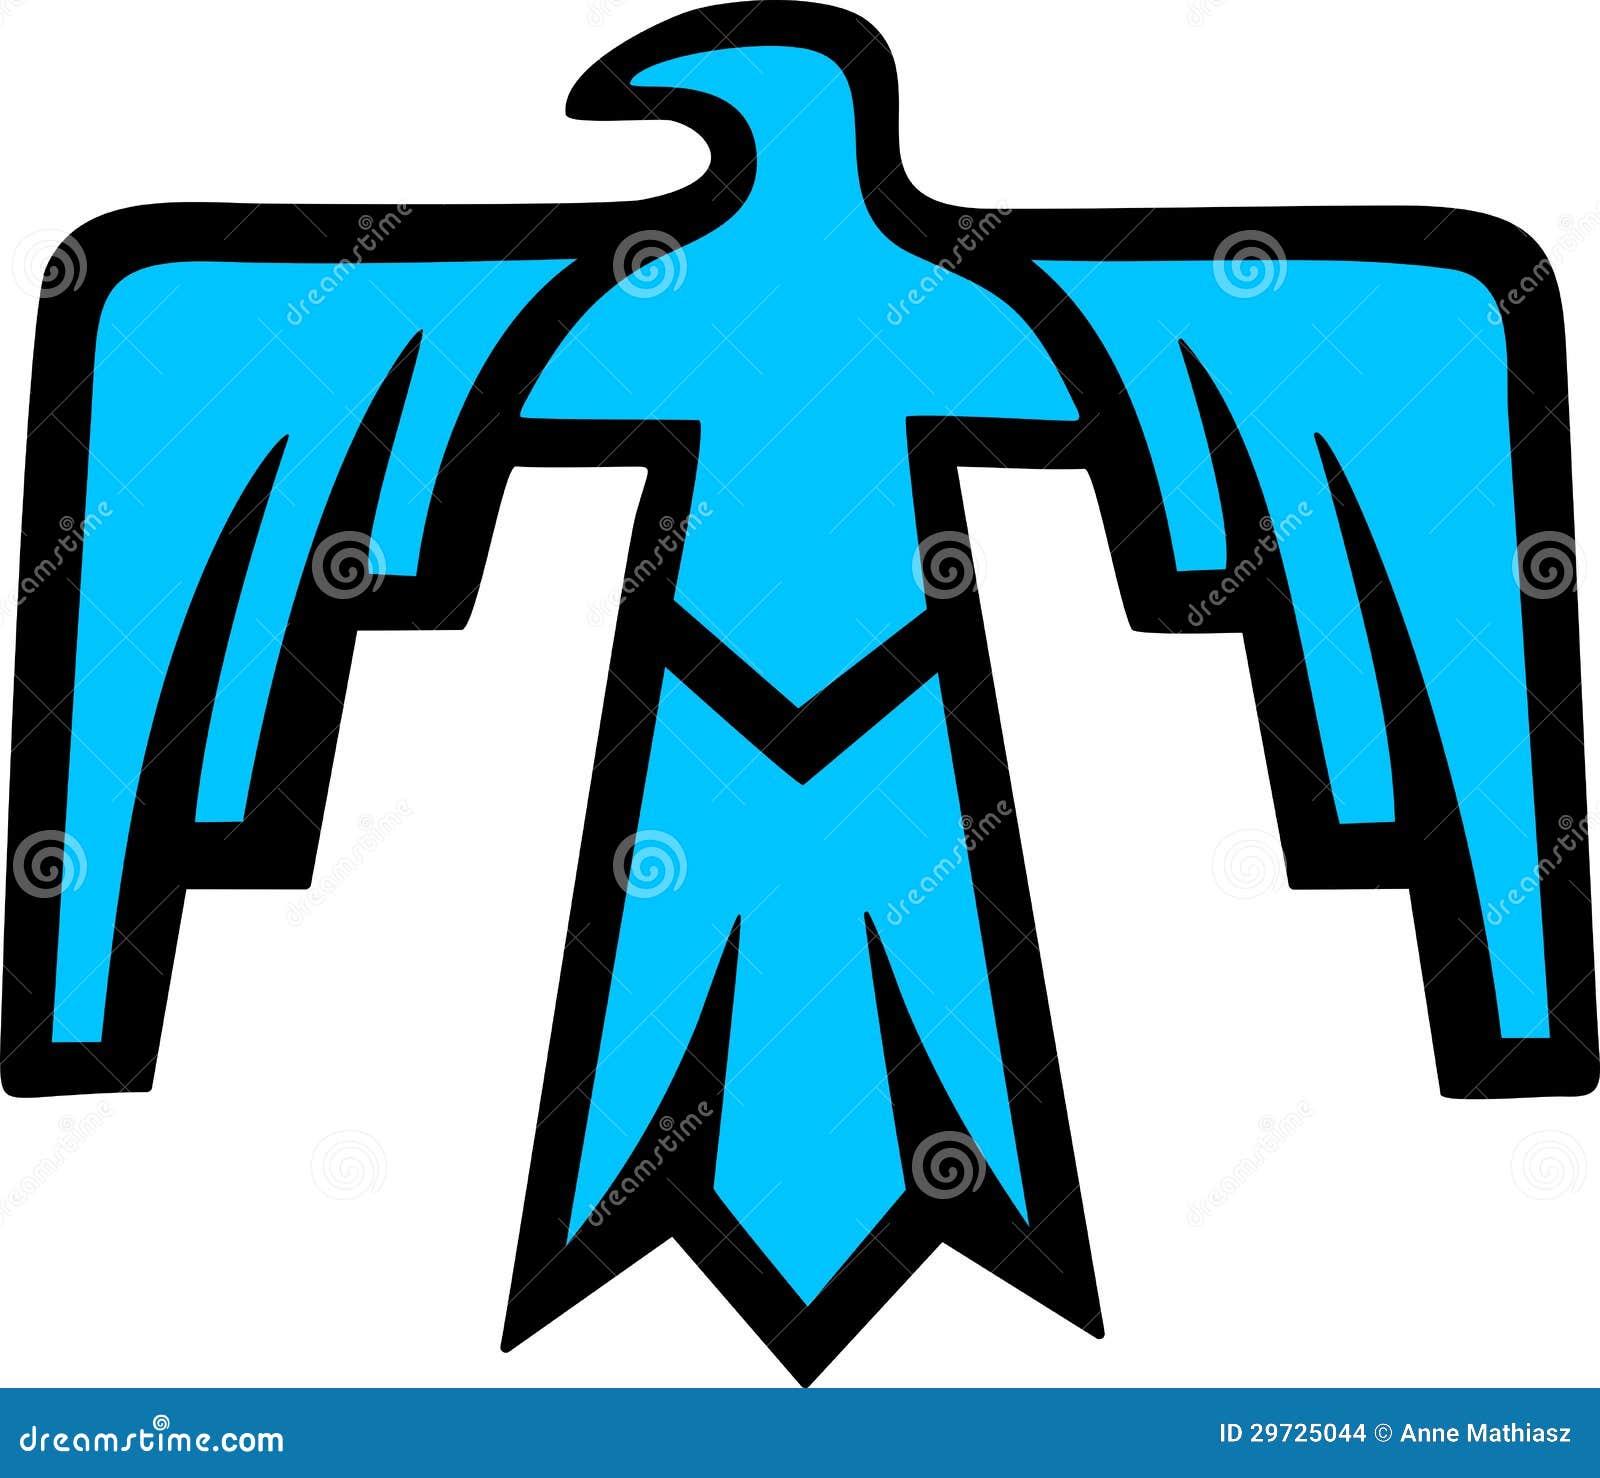 Thunderbird Native American Symbol Stock Vector Illustration Of